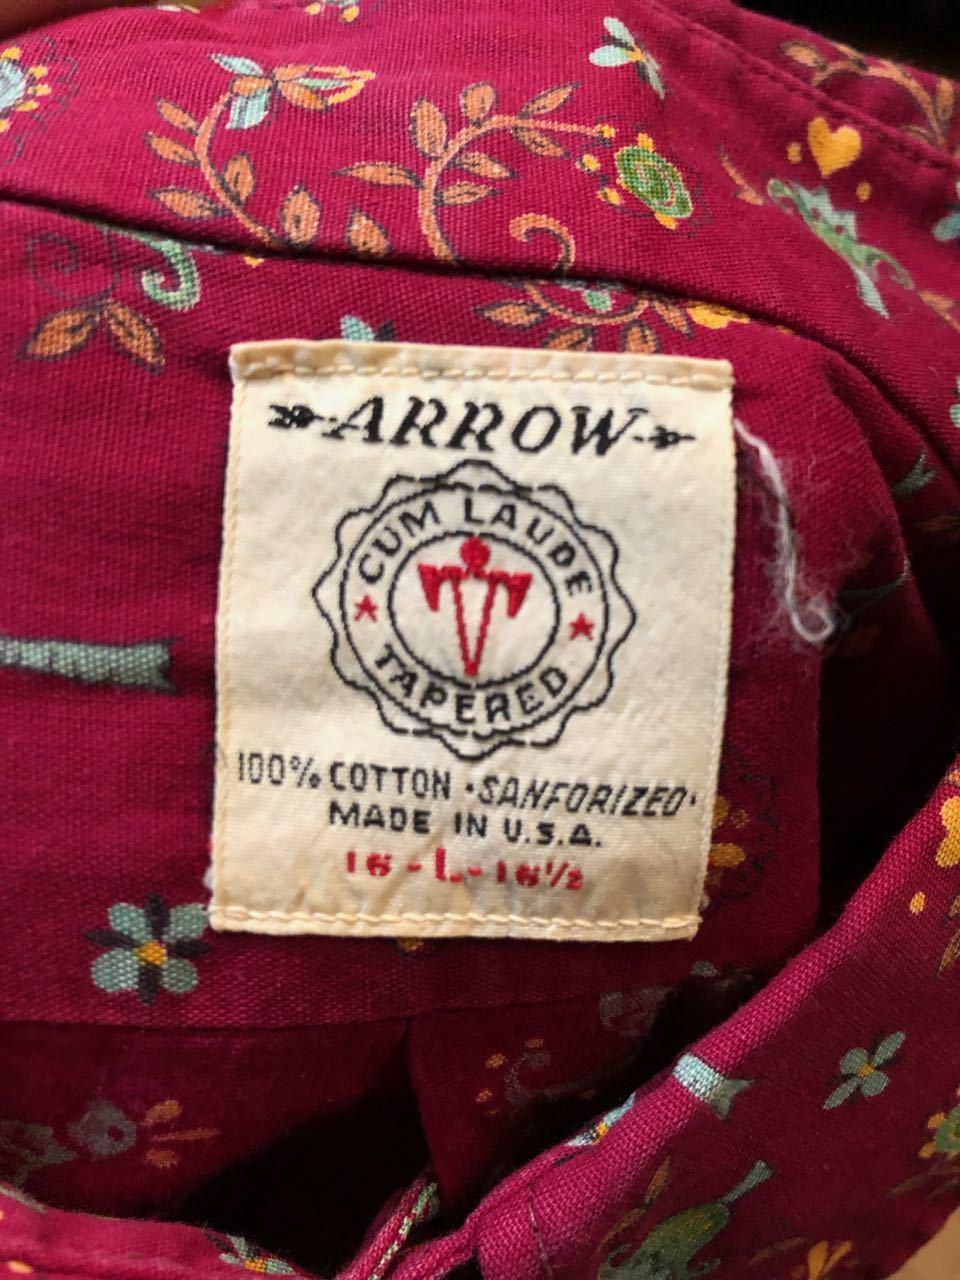 春物大量入荷!3月16日(土)入荷!60s all cotton !Arrow B.D シャツ!_c0144020_14095624.jpg